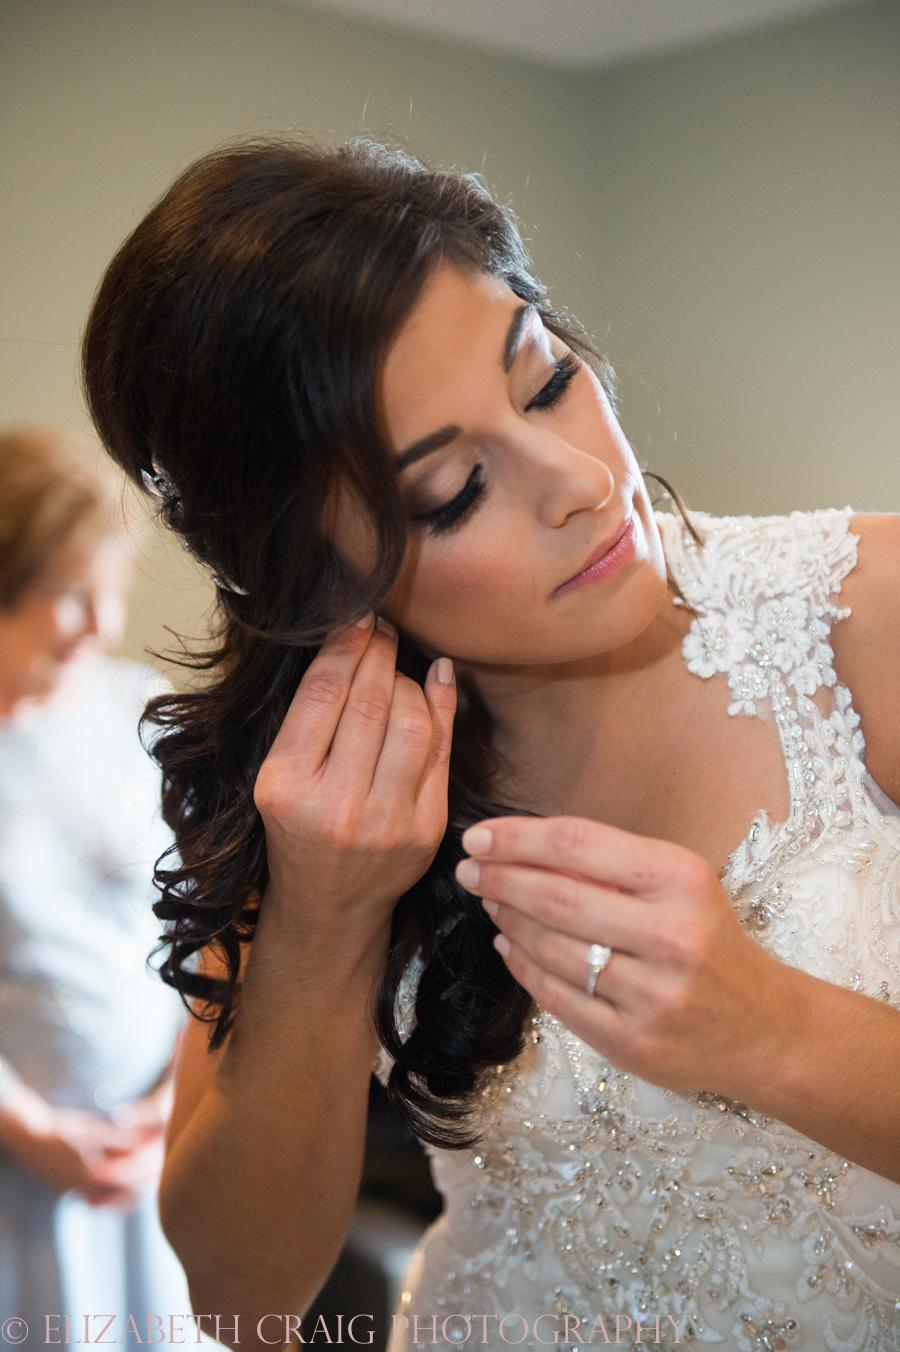 pittsburgh-greek-weddings-fairmont-weddings-receptions-elizabeth-craig-photohgraphy-005